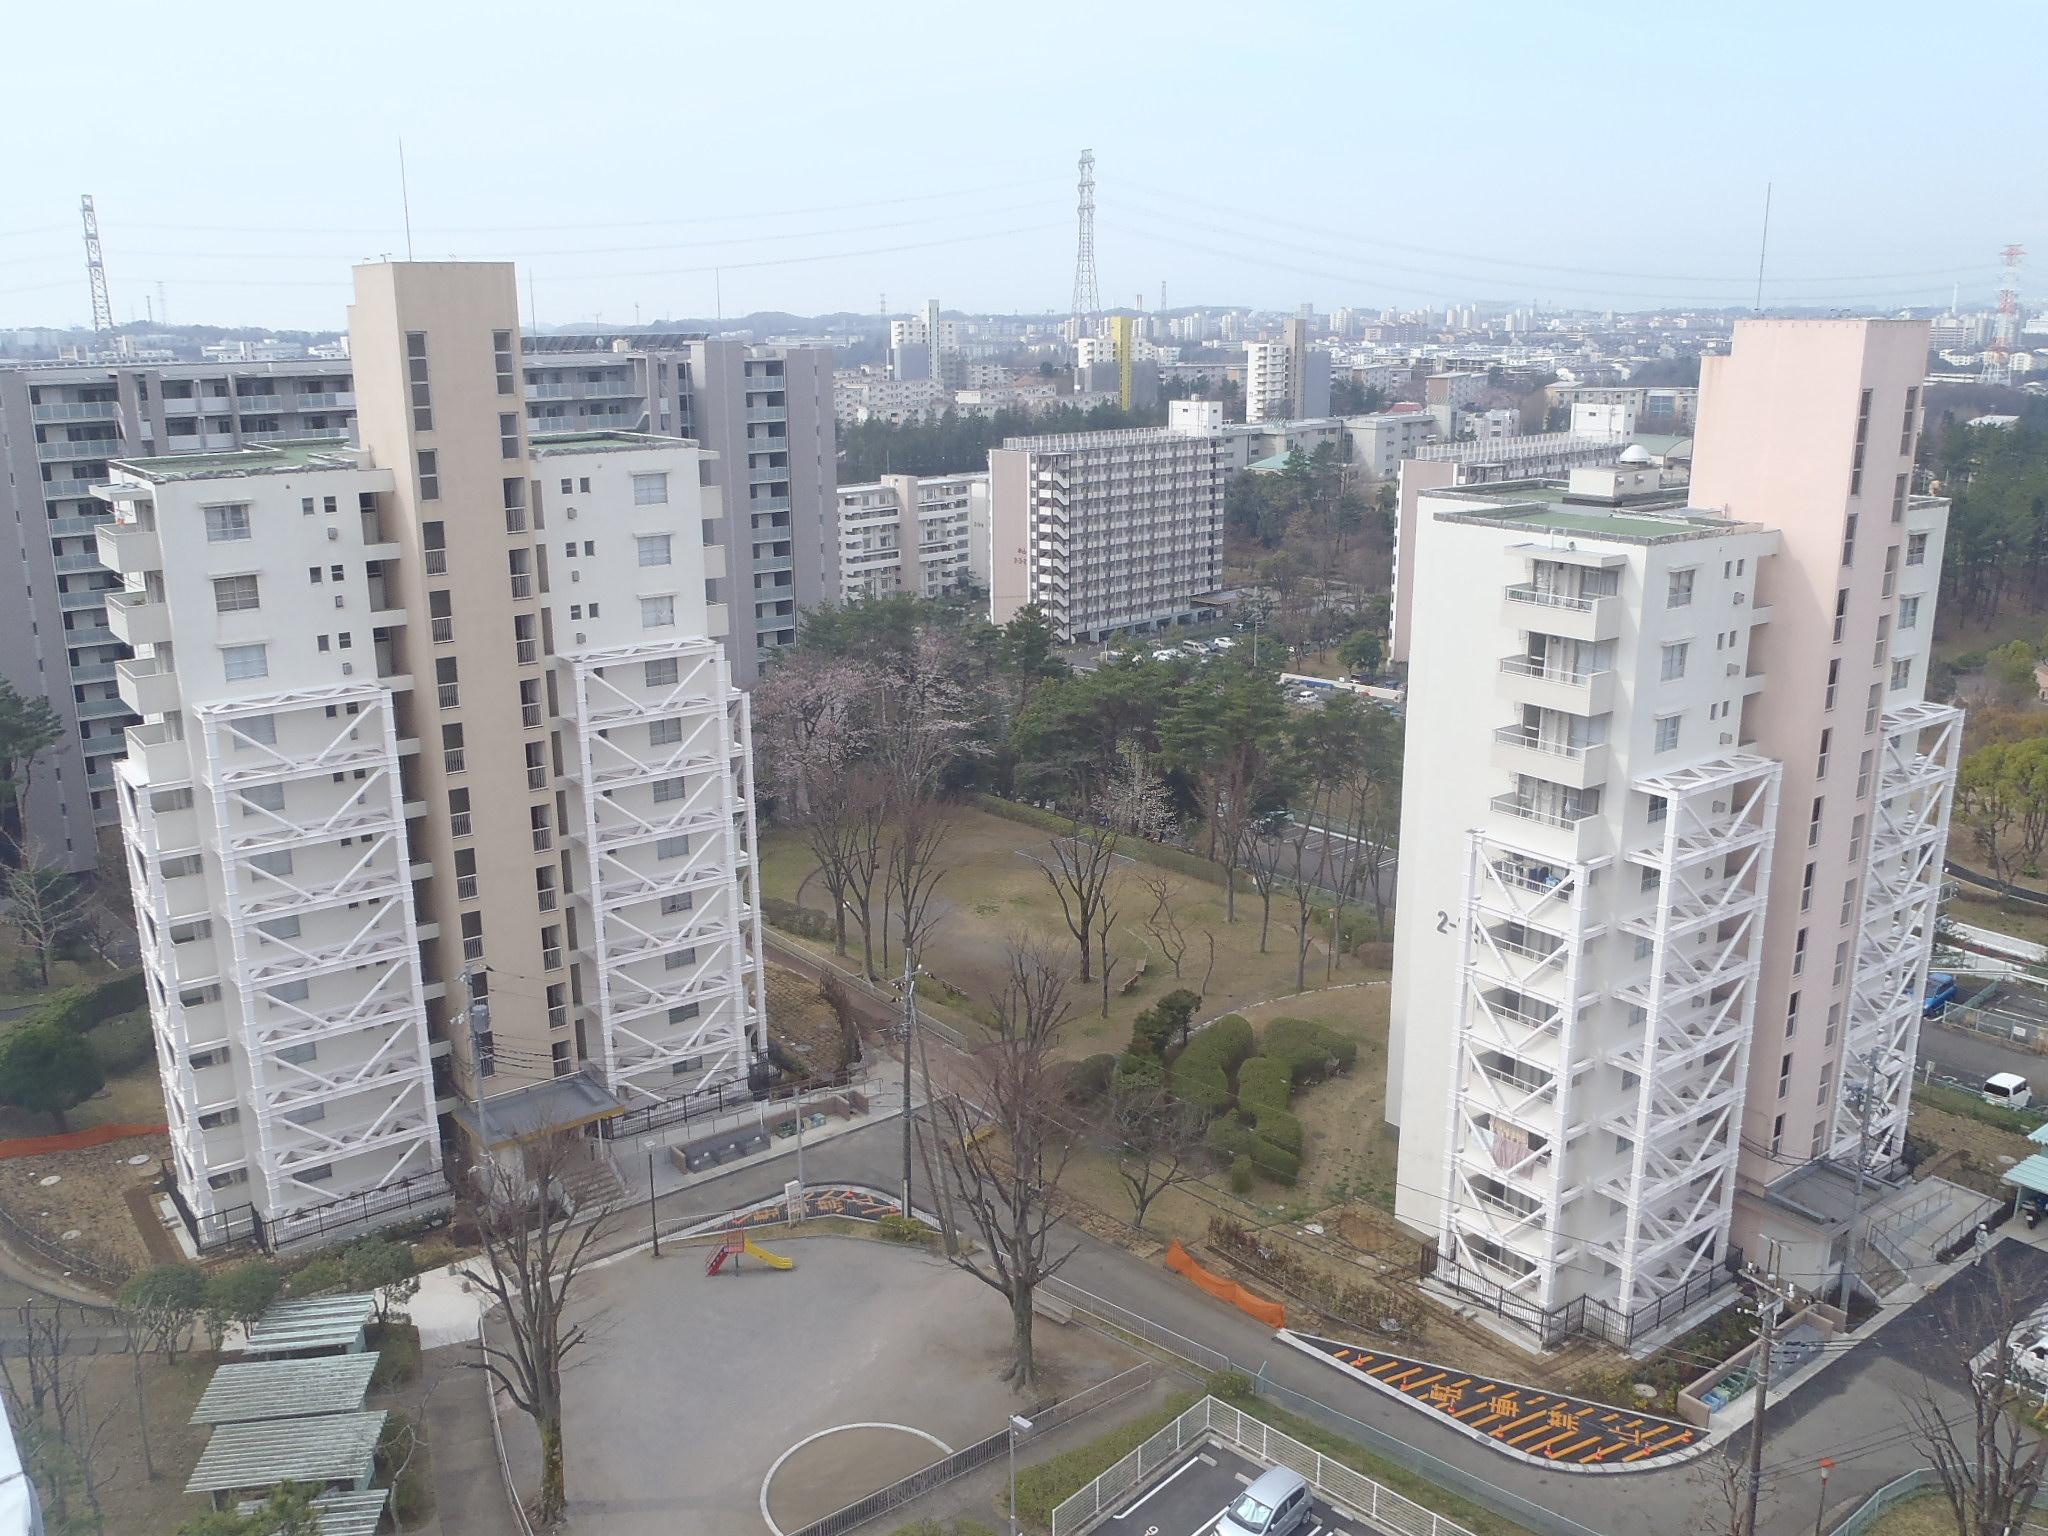 多摩ニュータウン諏訪永山団地耐震改修